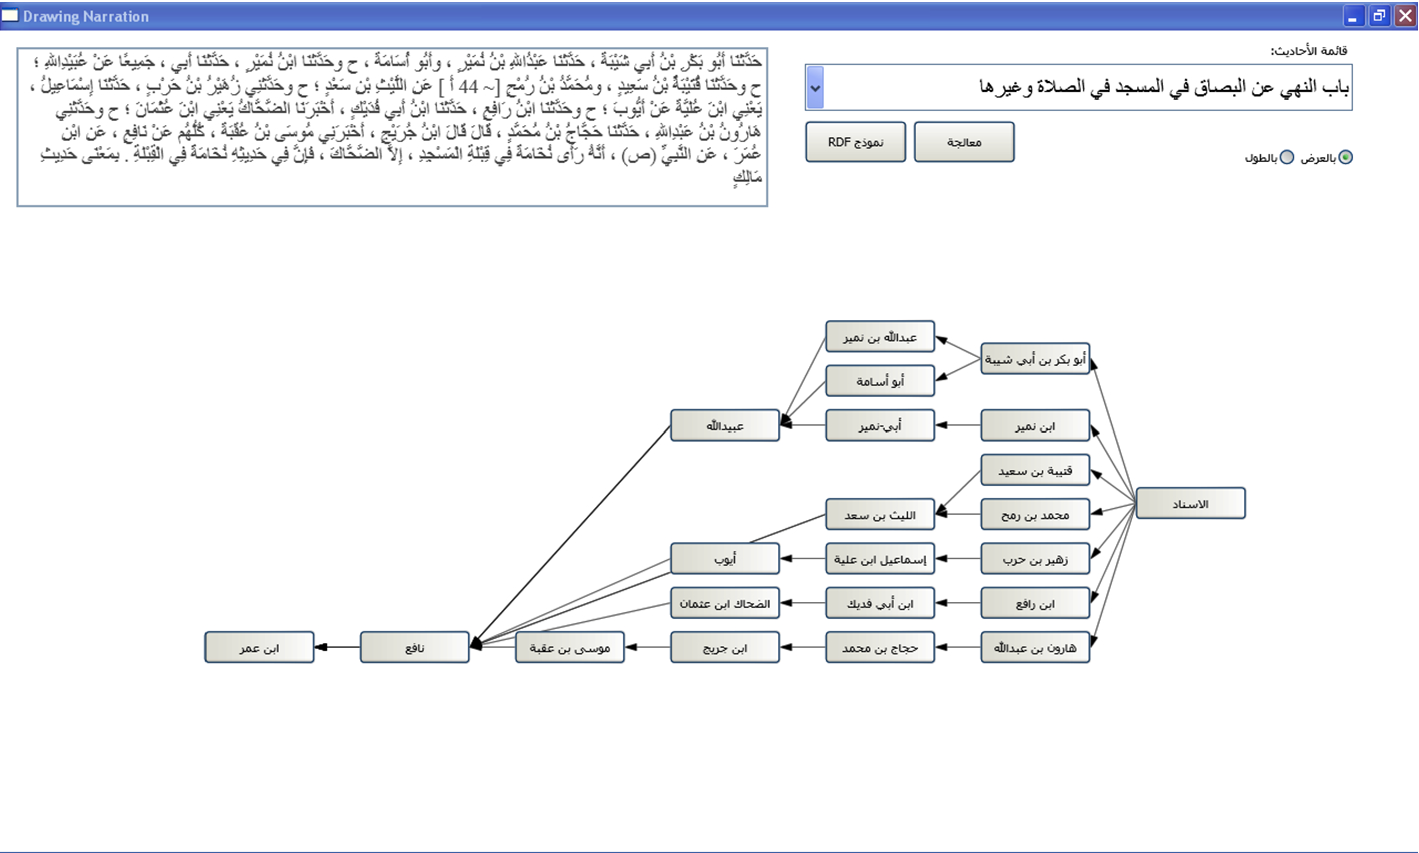 Computational and natural language processing based studies